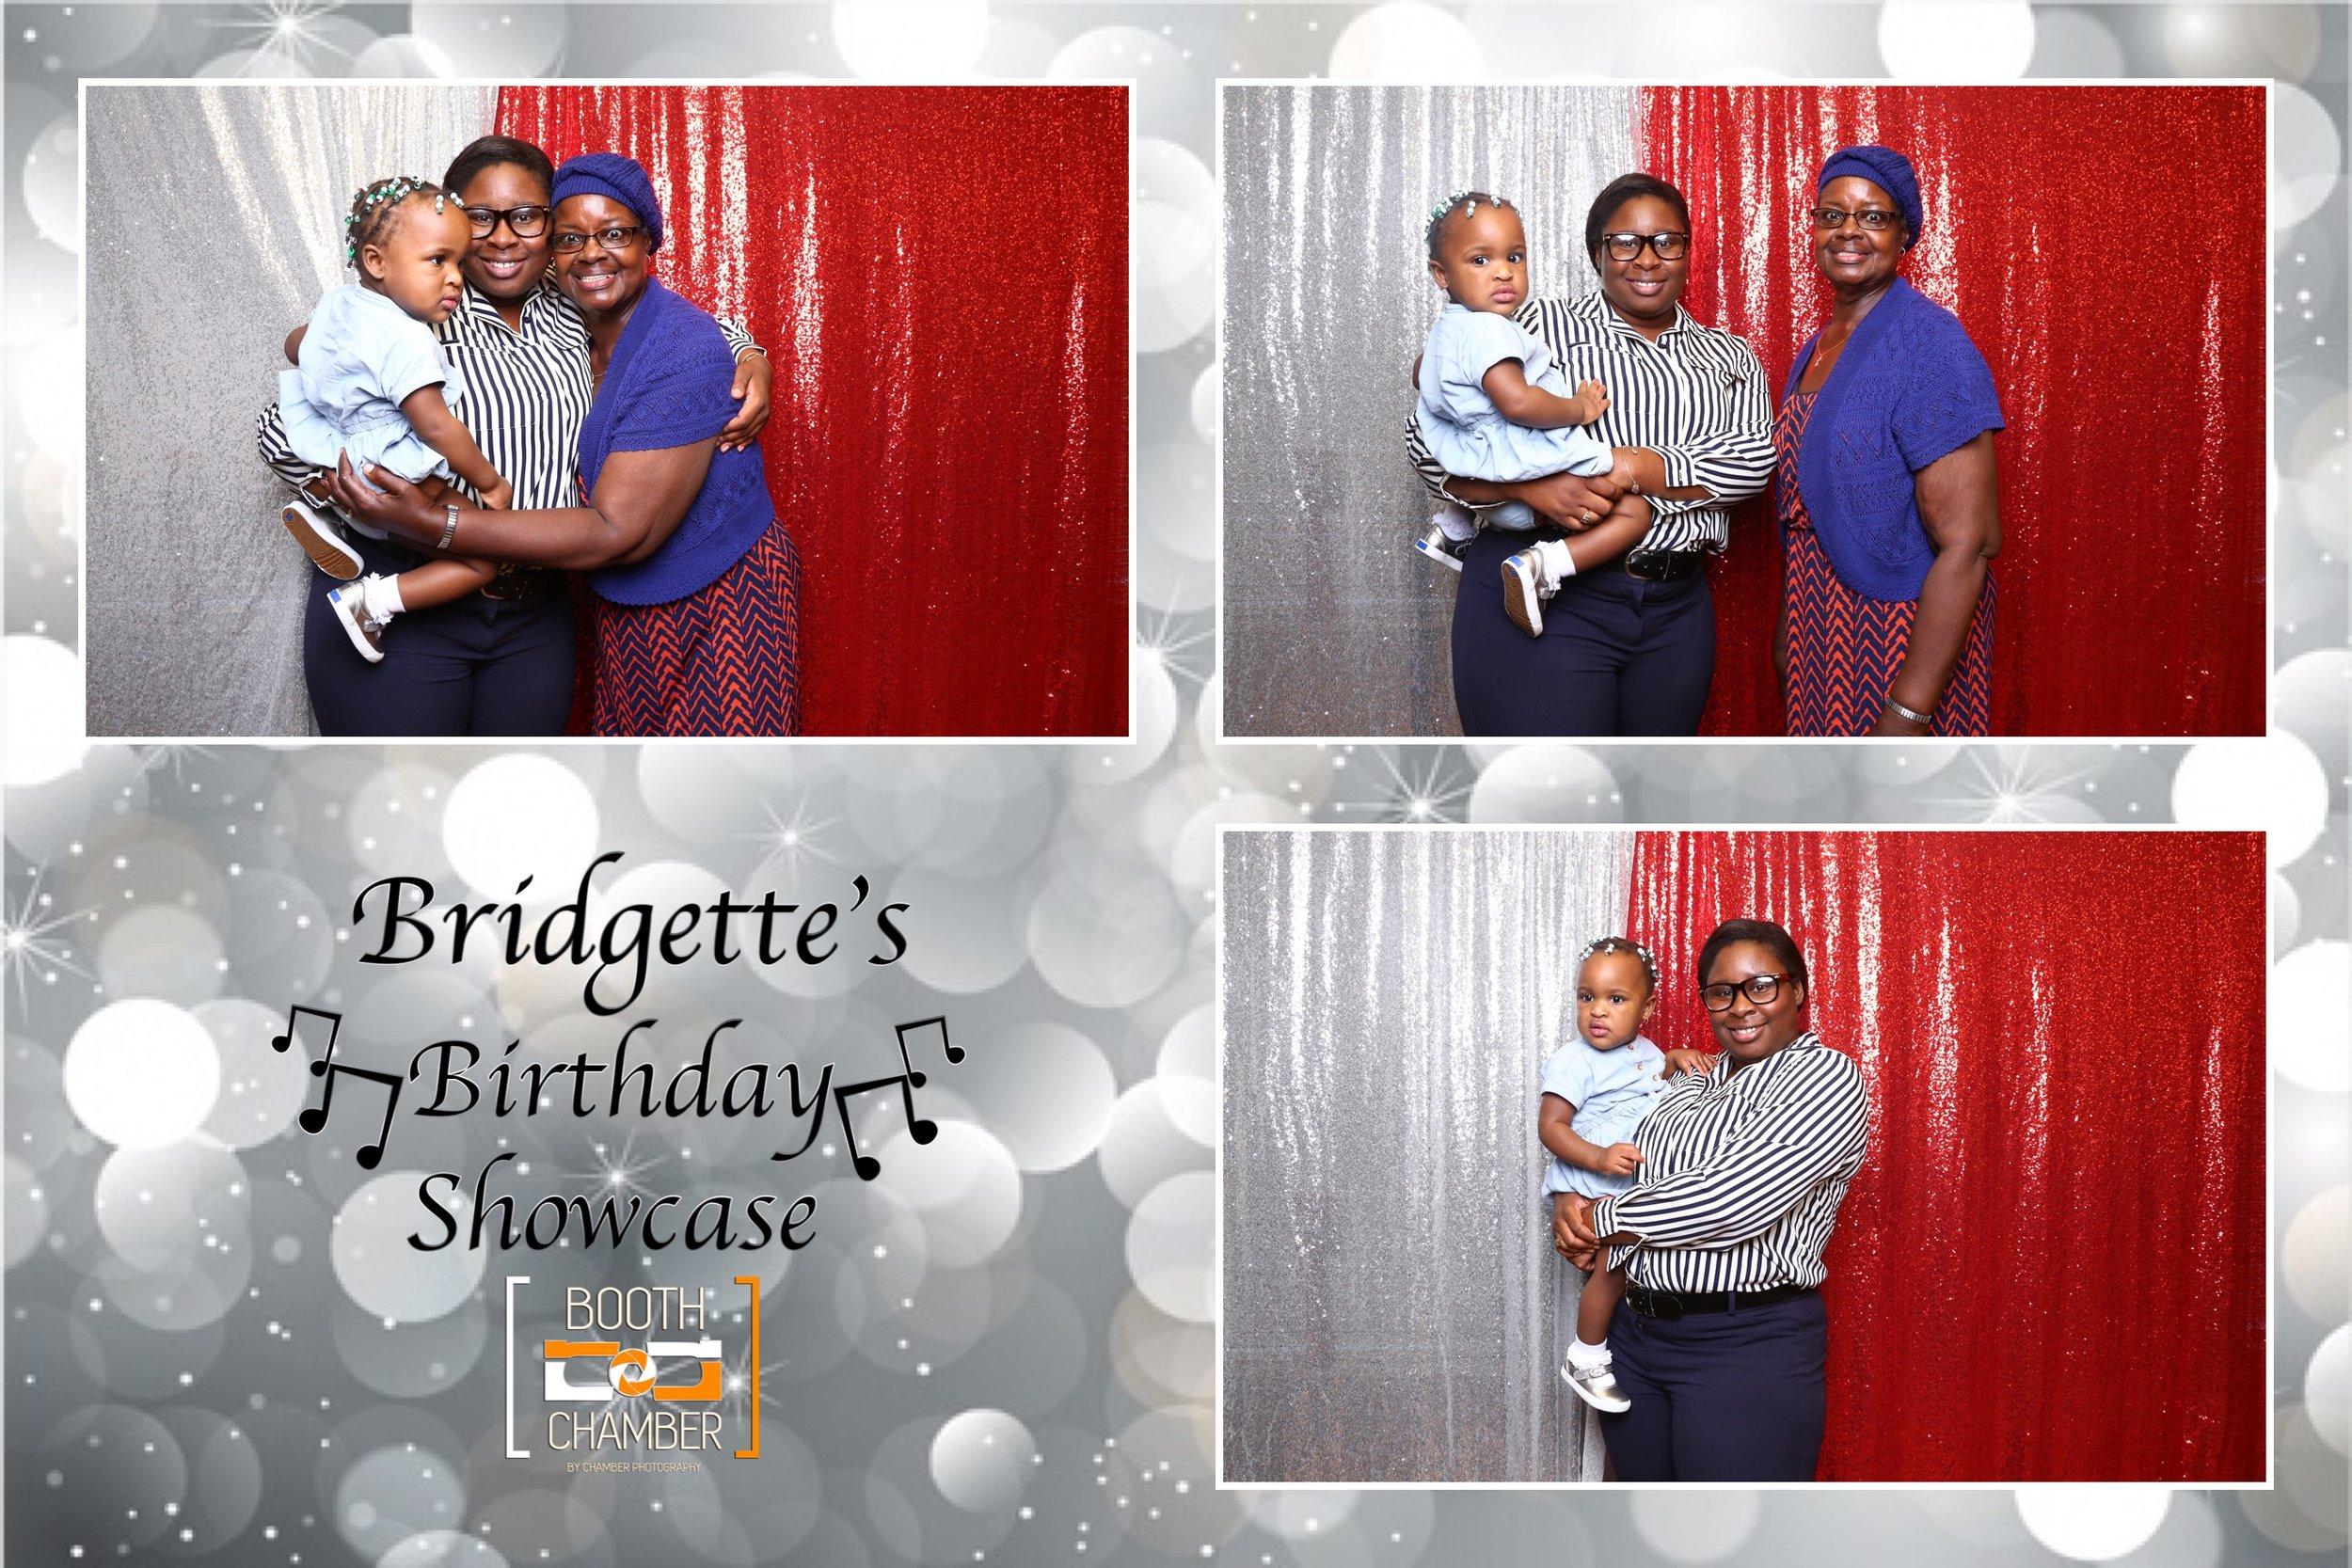 Bridgette's Birthday Showcase-58-04-30-2018.jpg